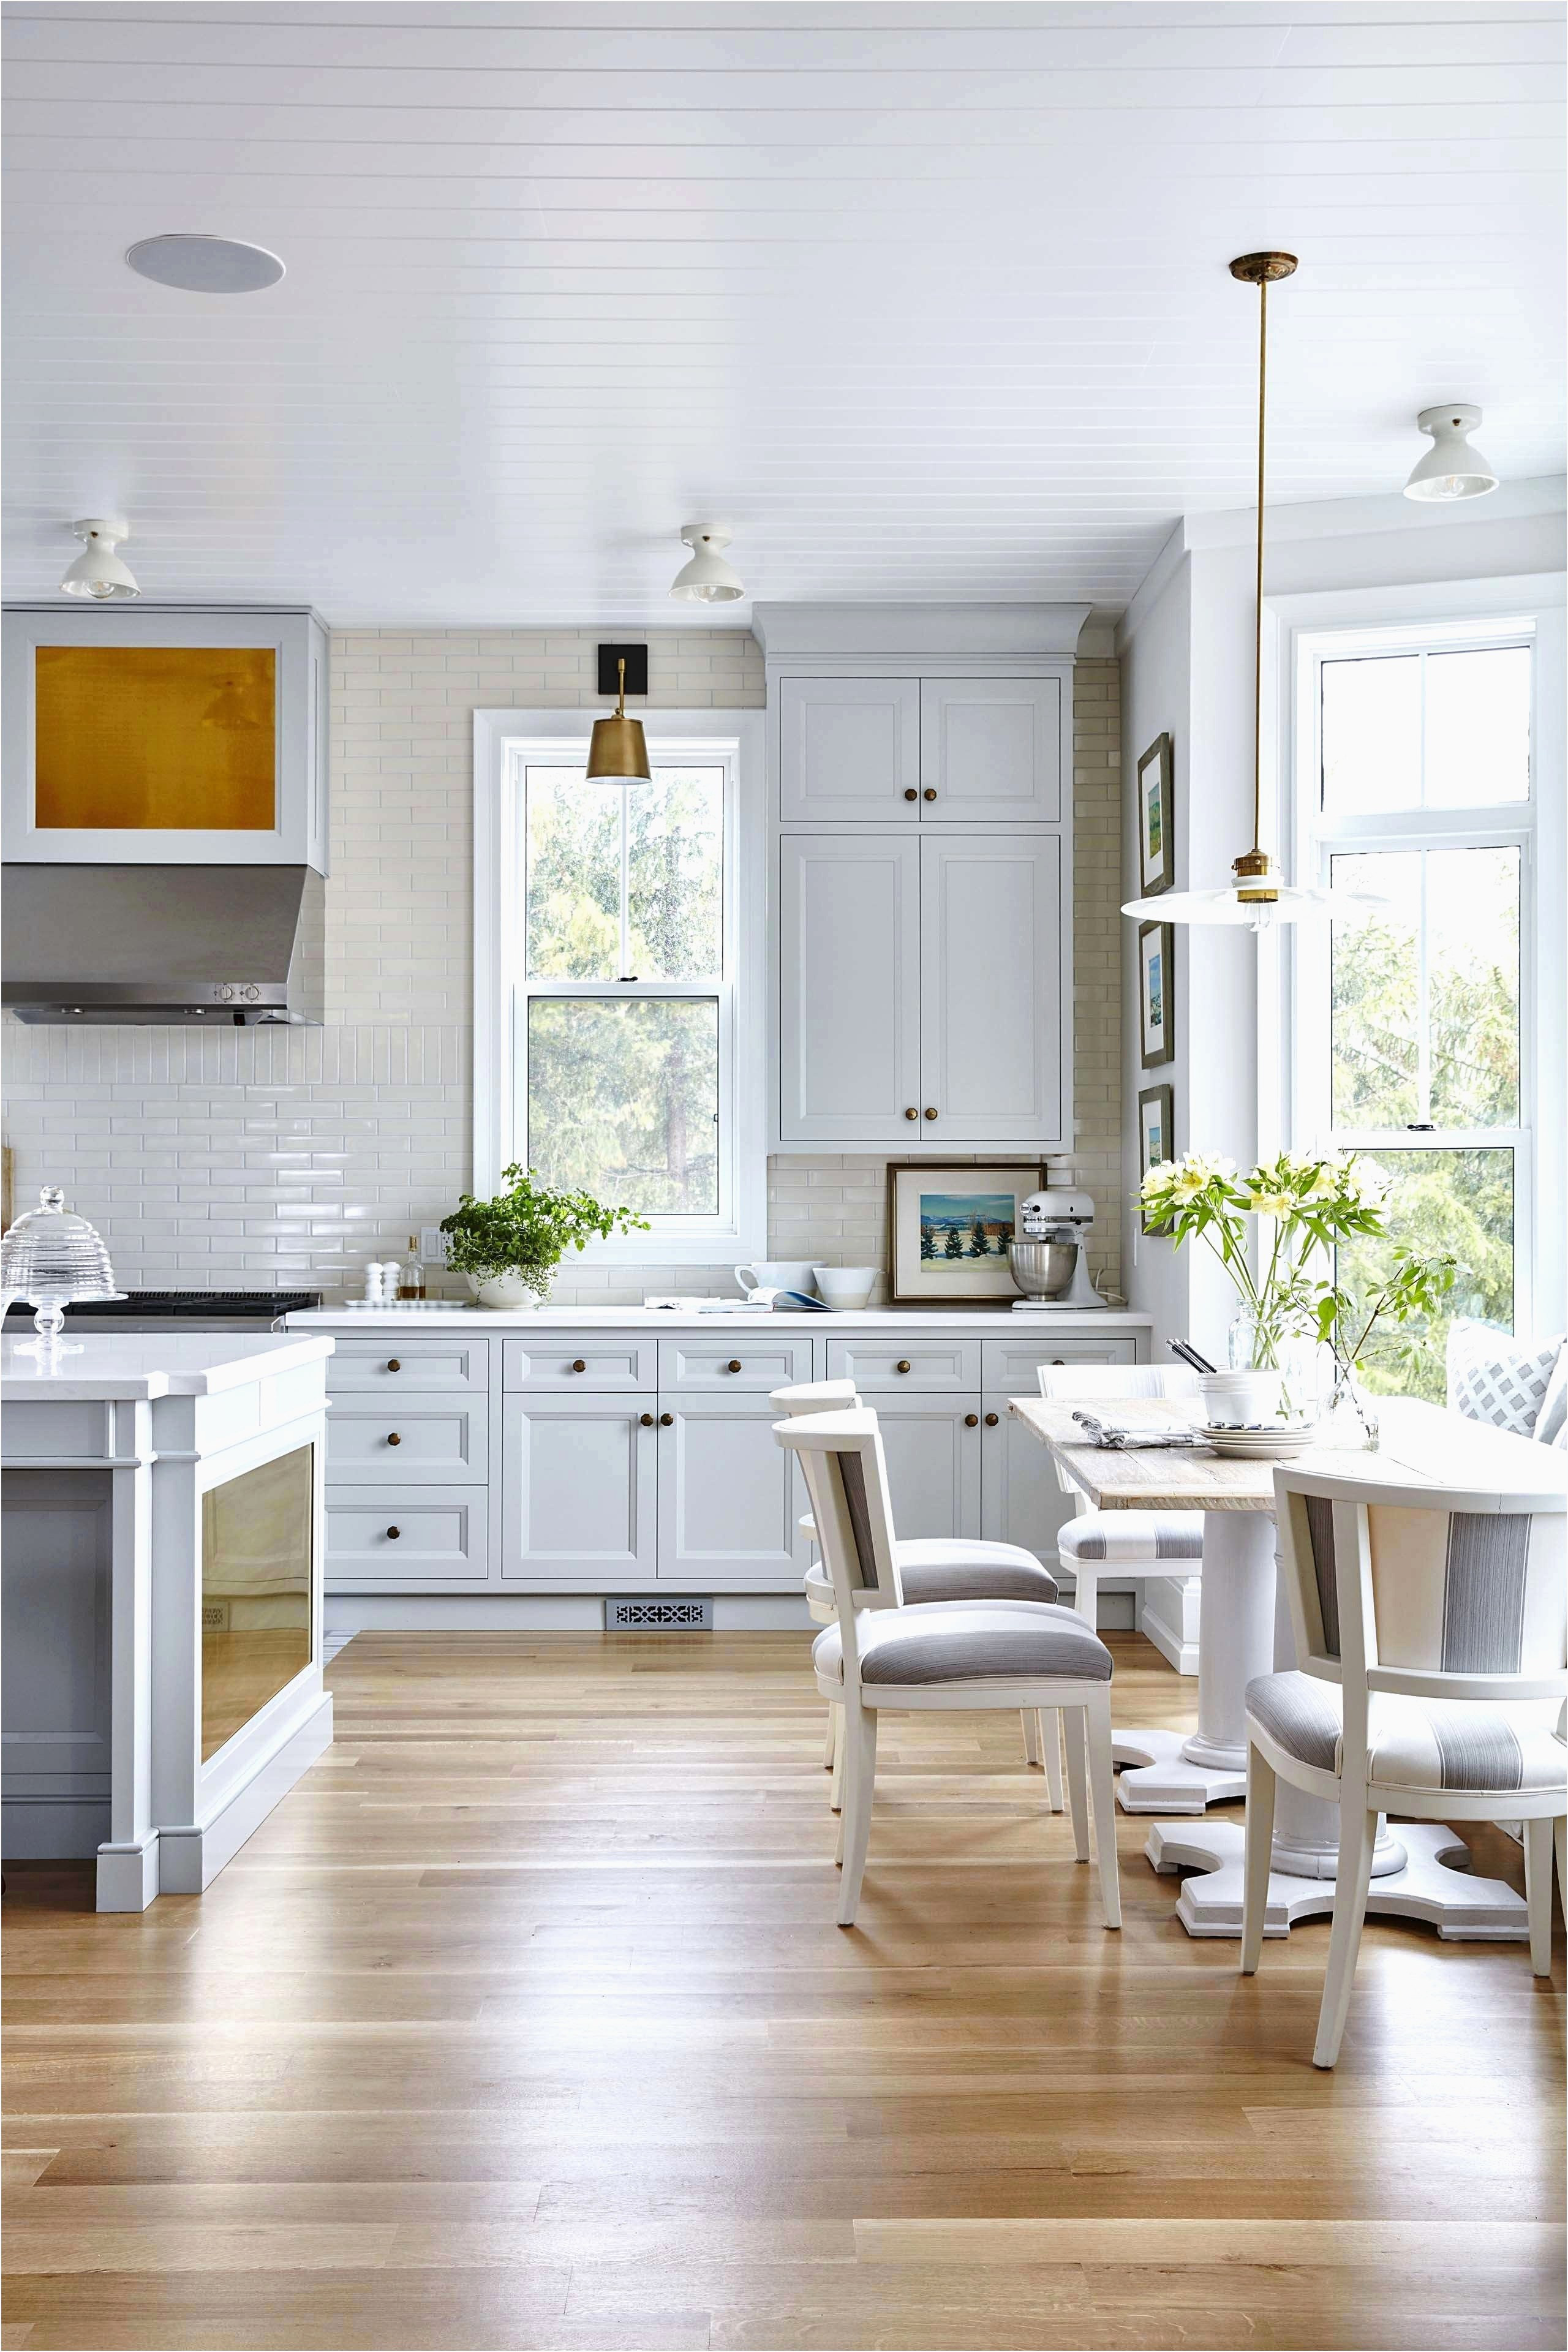 discount hardwood flooring denver of the wooden floor floor for the wooden floor 24 basic ceramic tile that looks like hardwood peritile